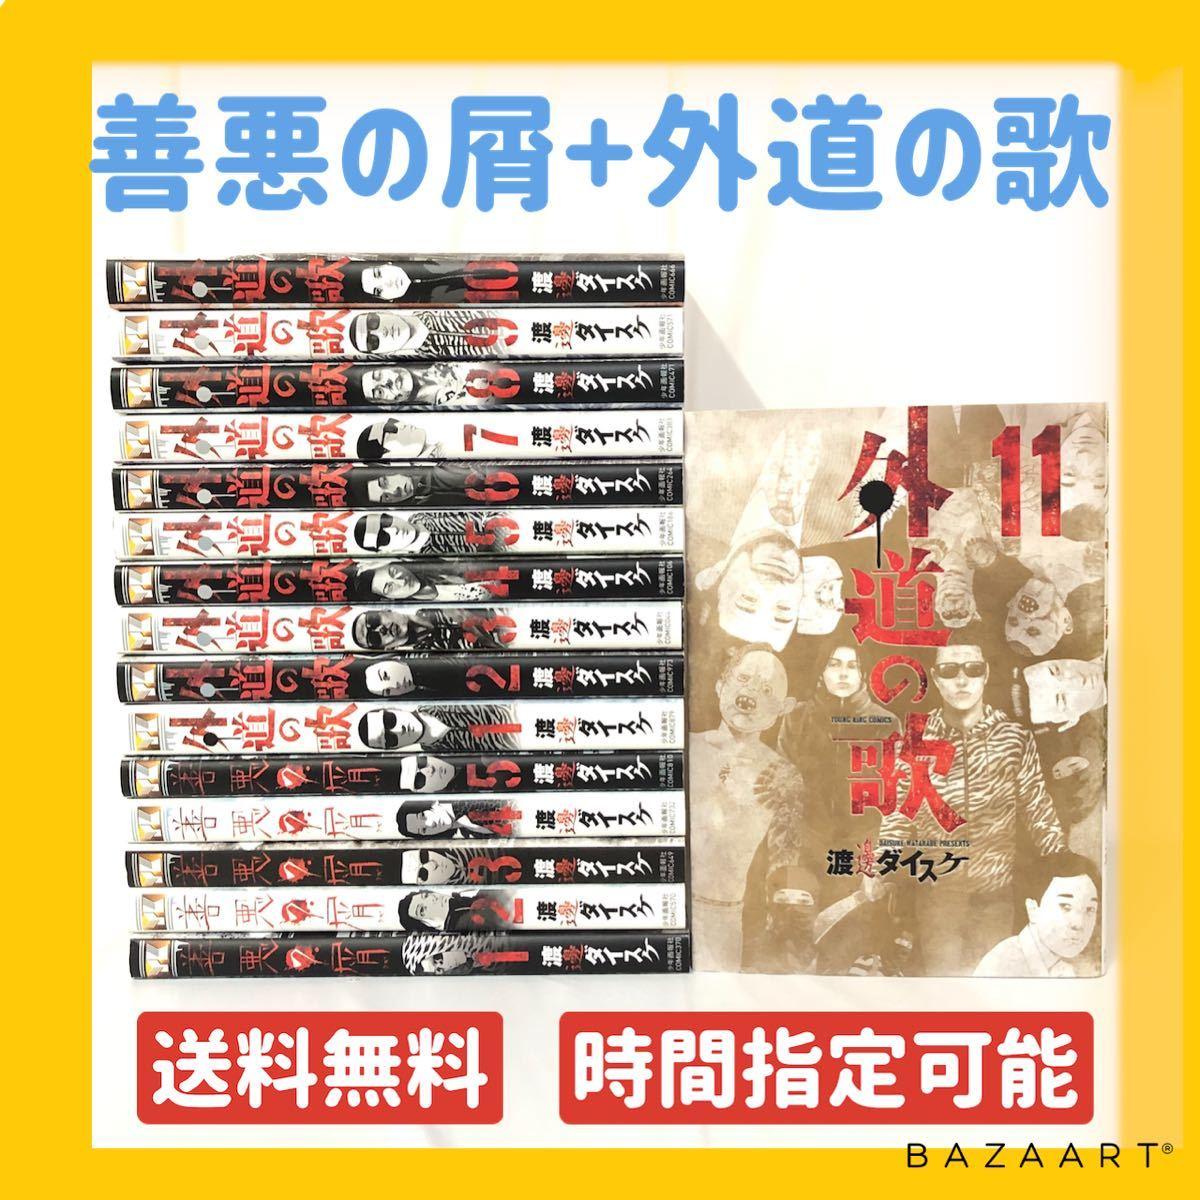 【送料無料】善悪の屑 1~5巻 全巻完結 + 外道の歌 1~11巻 既巻 全巻